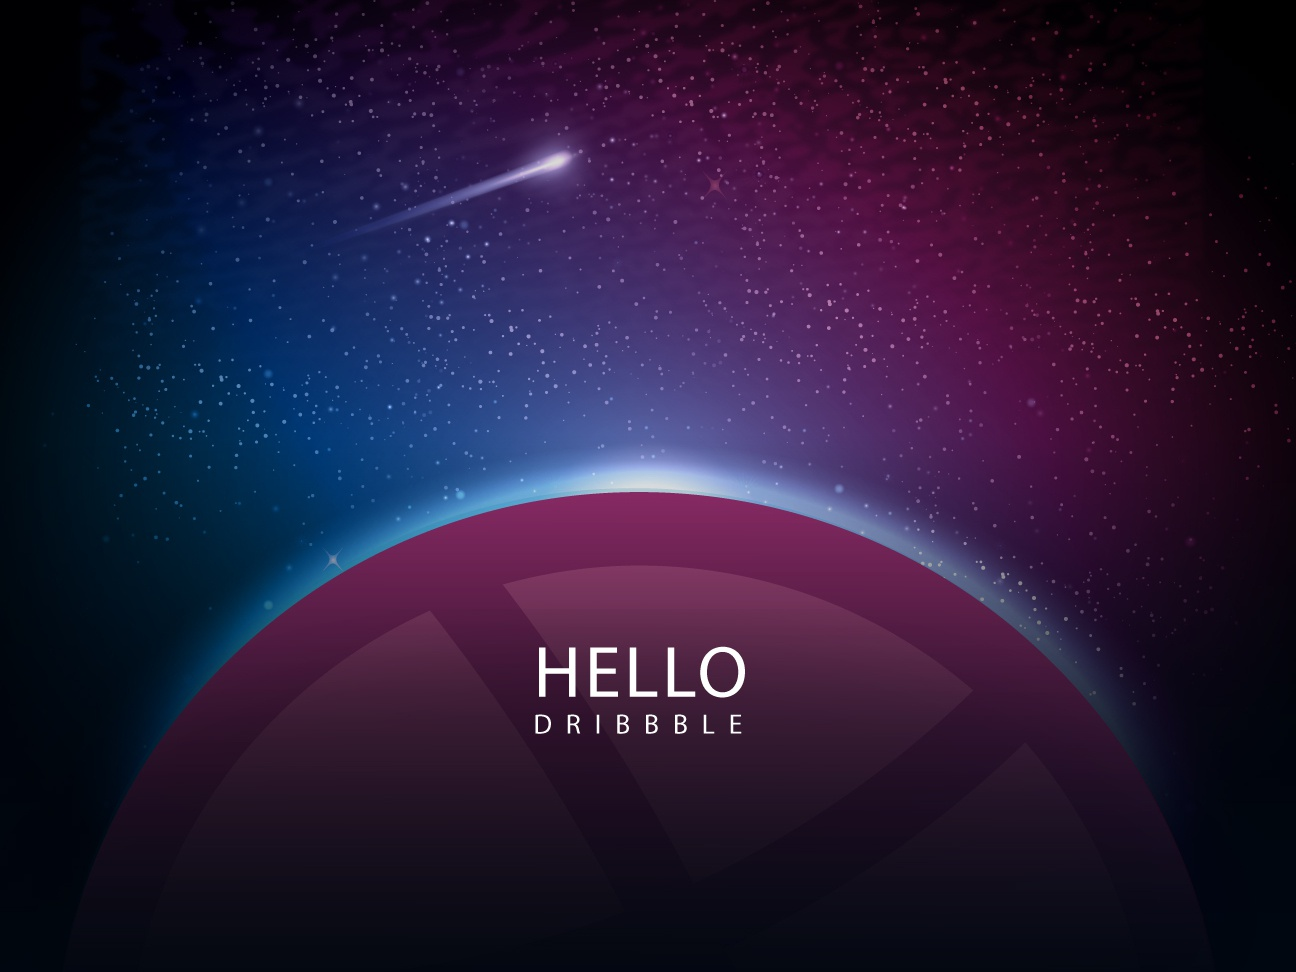 Hello Dribbble hello dribble dribbble hello